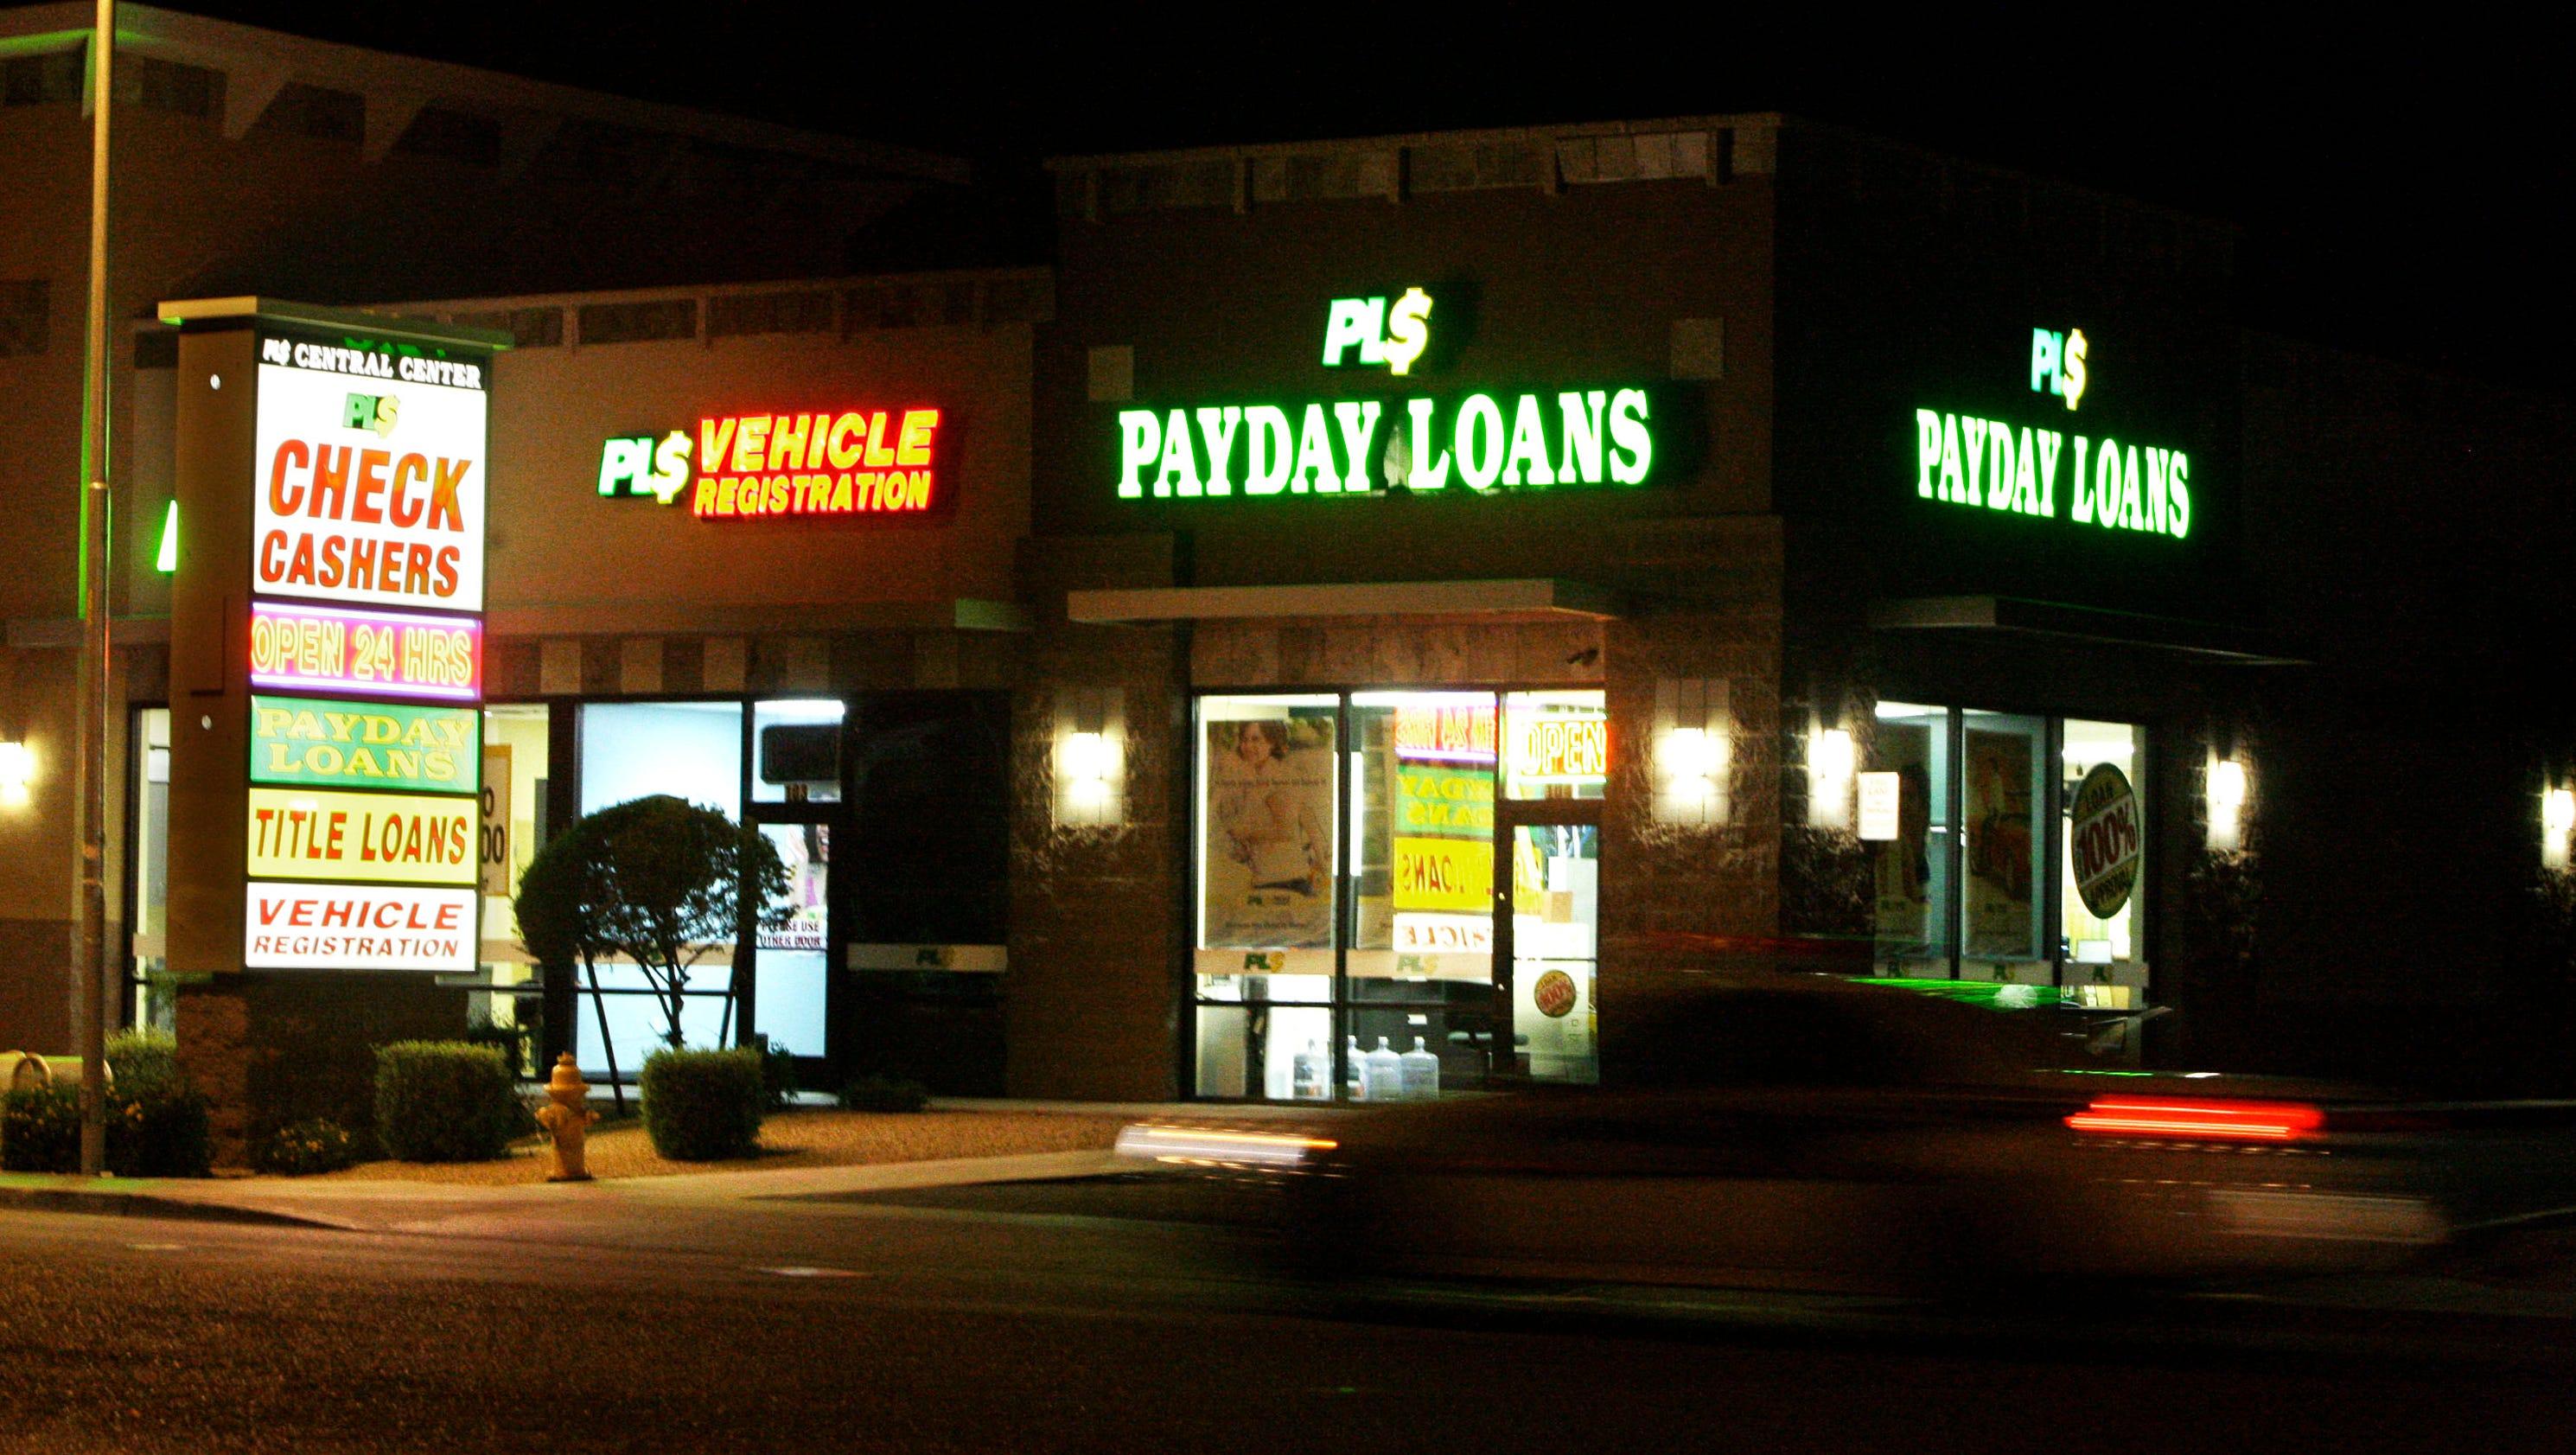 payday loans cfsa member